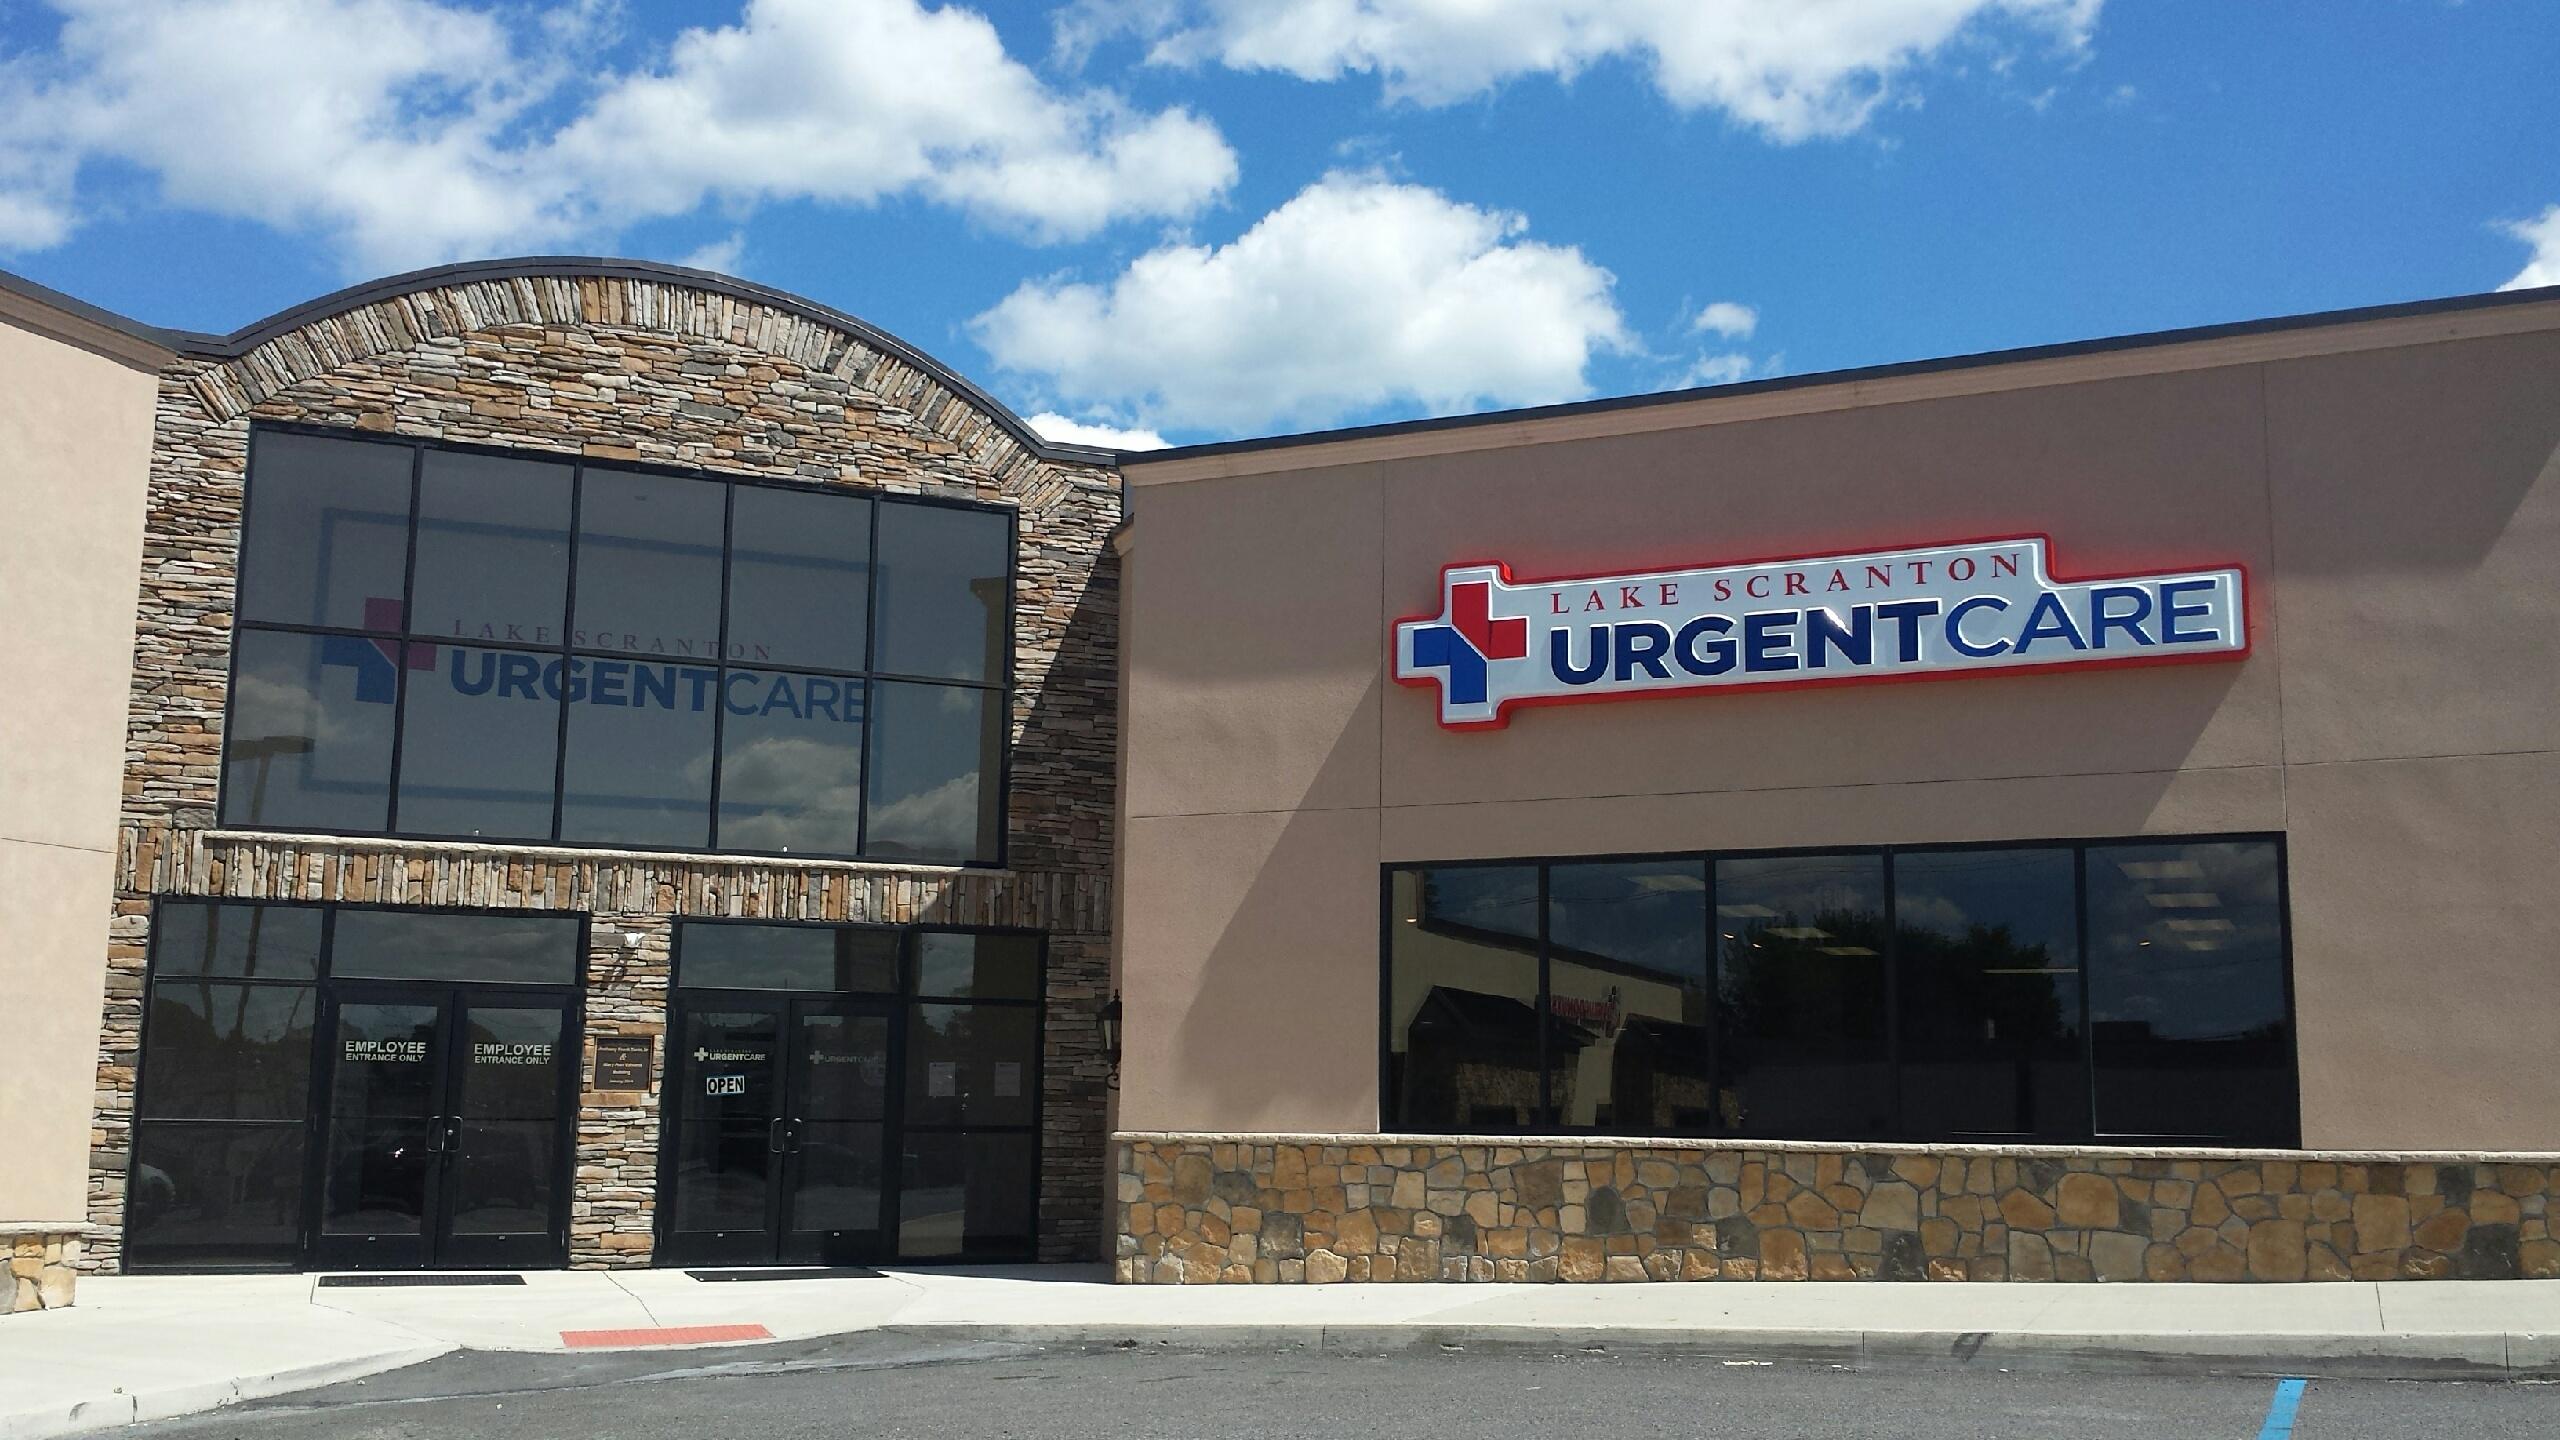 Geisinger Careworks Walk-in Clinic - Book Online - Urgent Care in